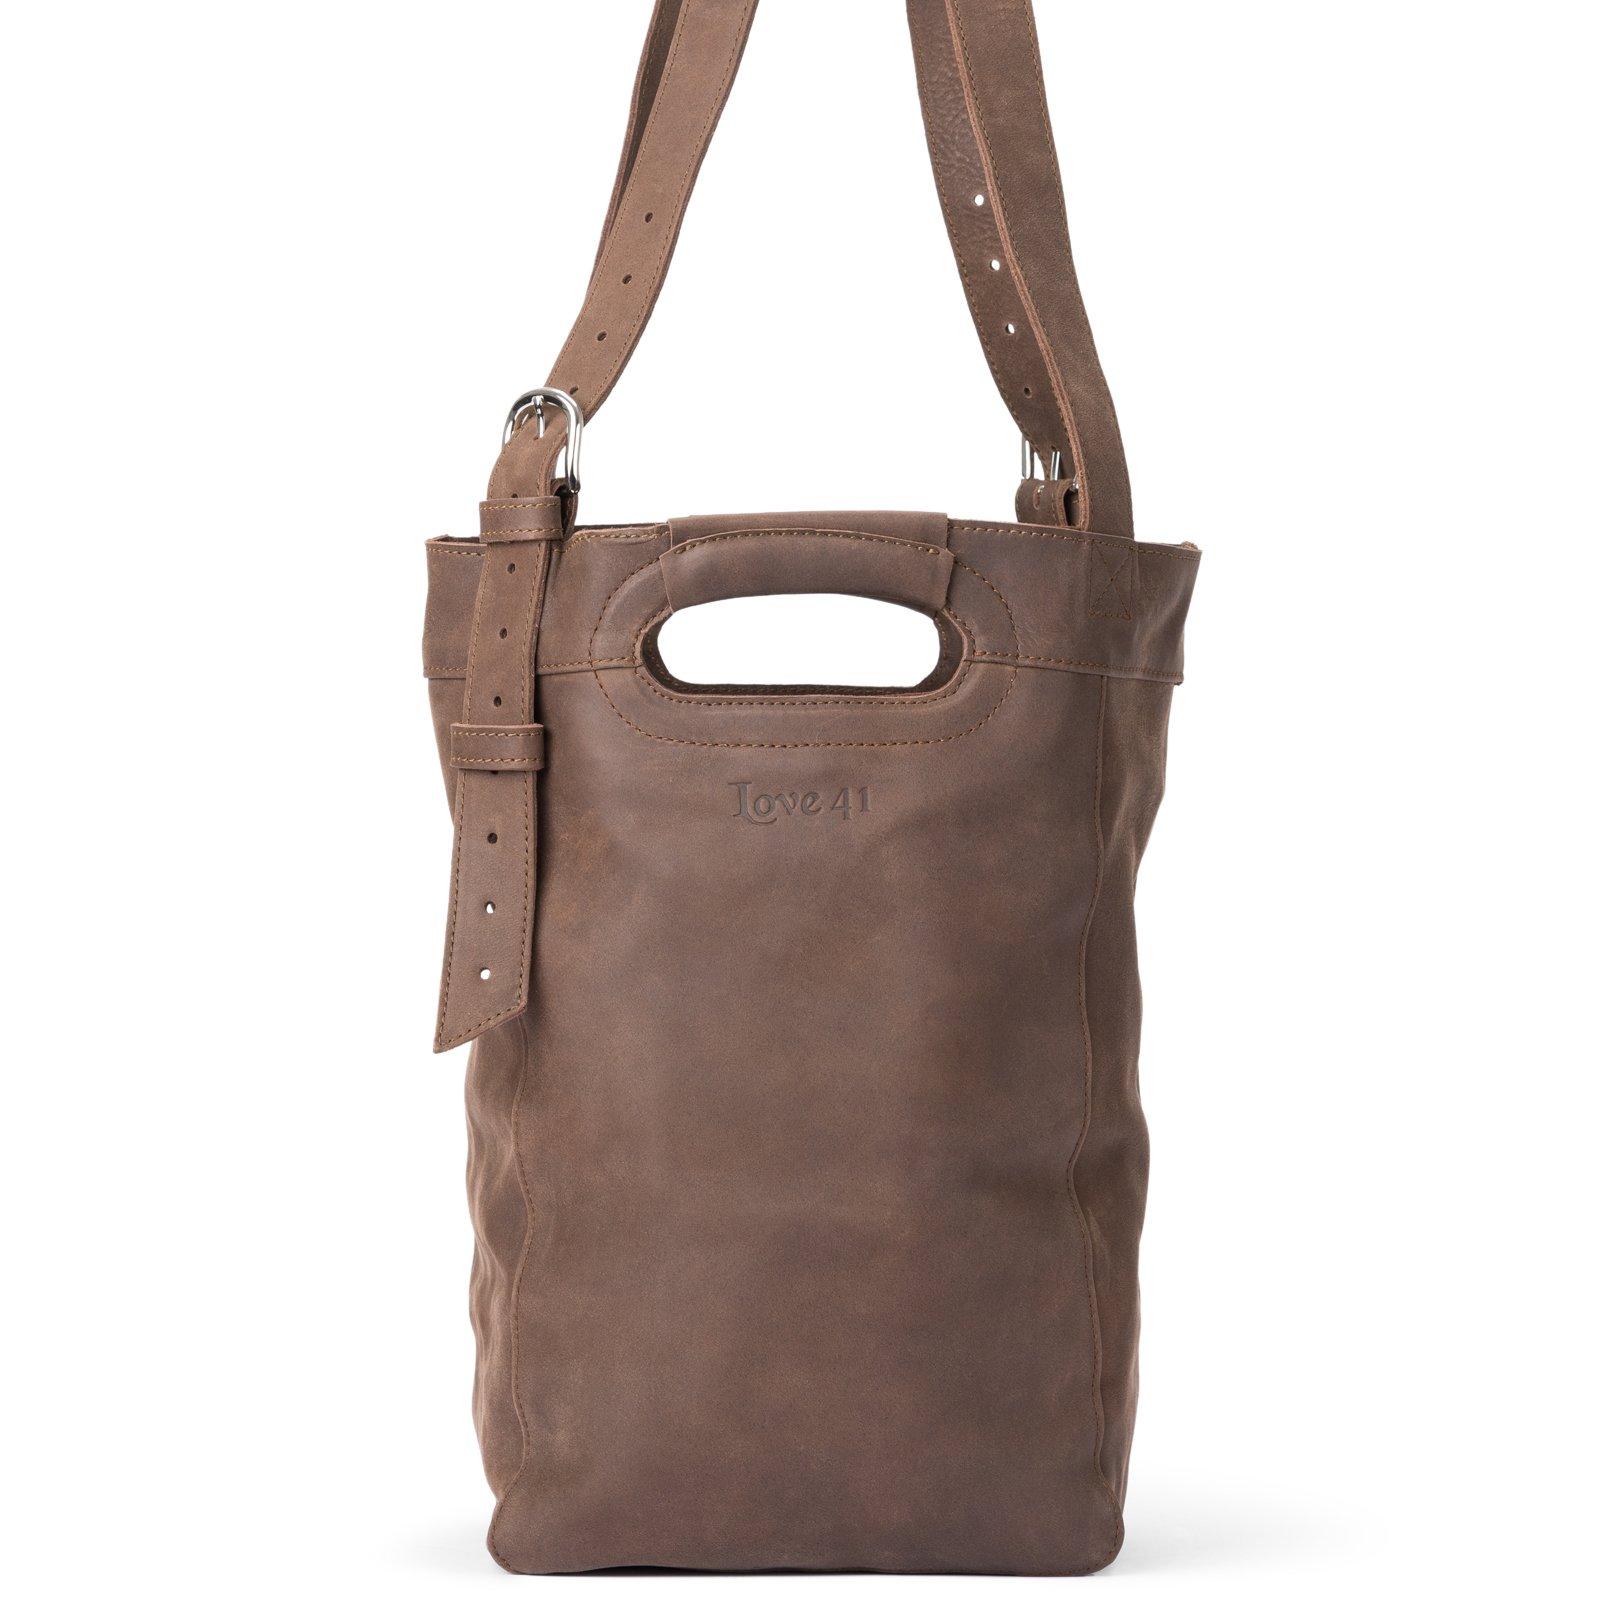 Love 41 Leather Bucket Bag (Dark Coffee) | Full Grain Leather 41 Year Warranty